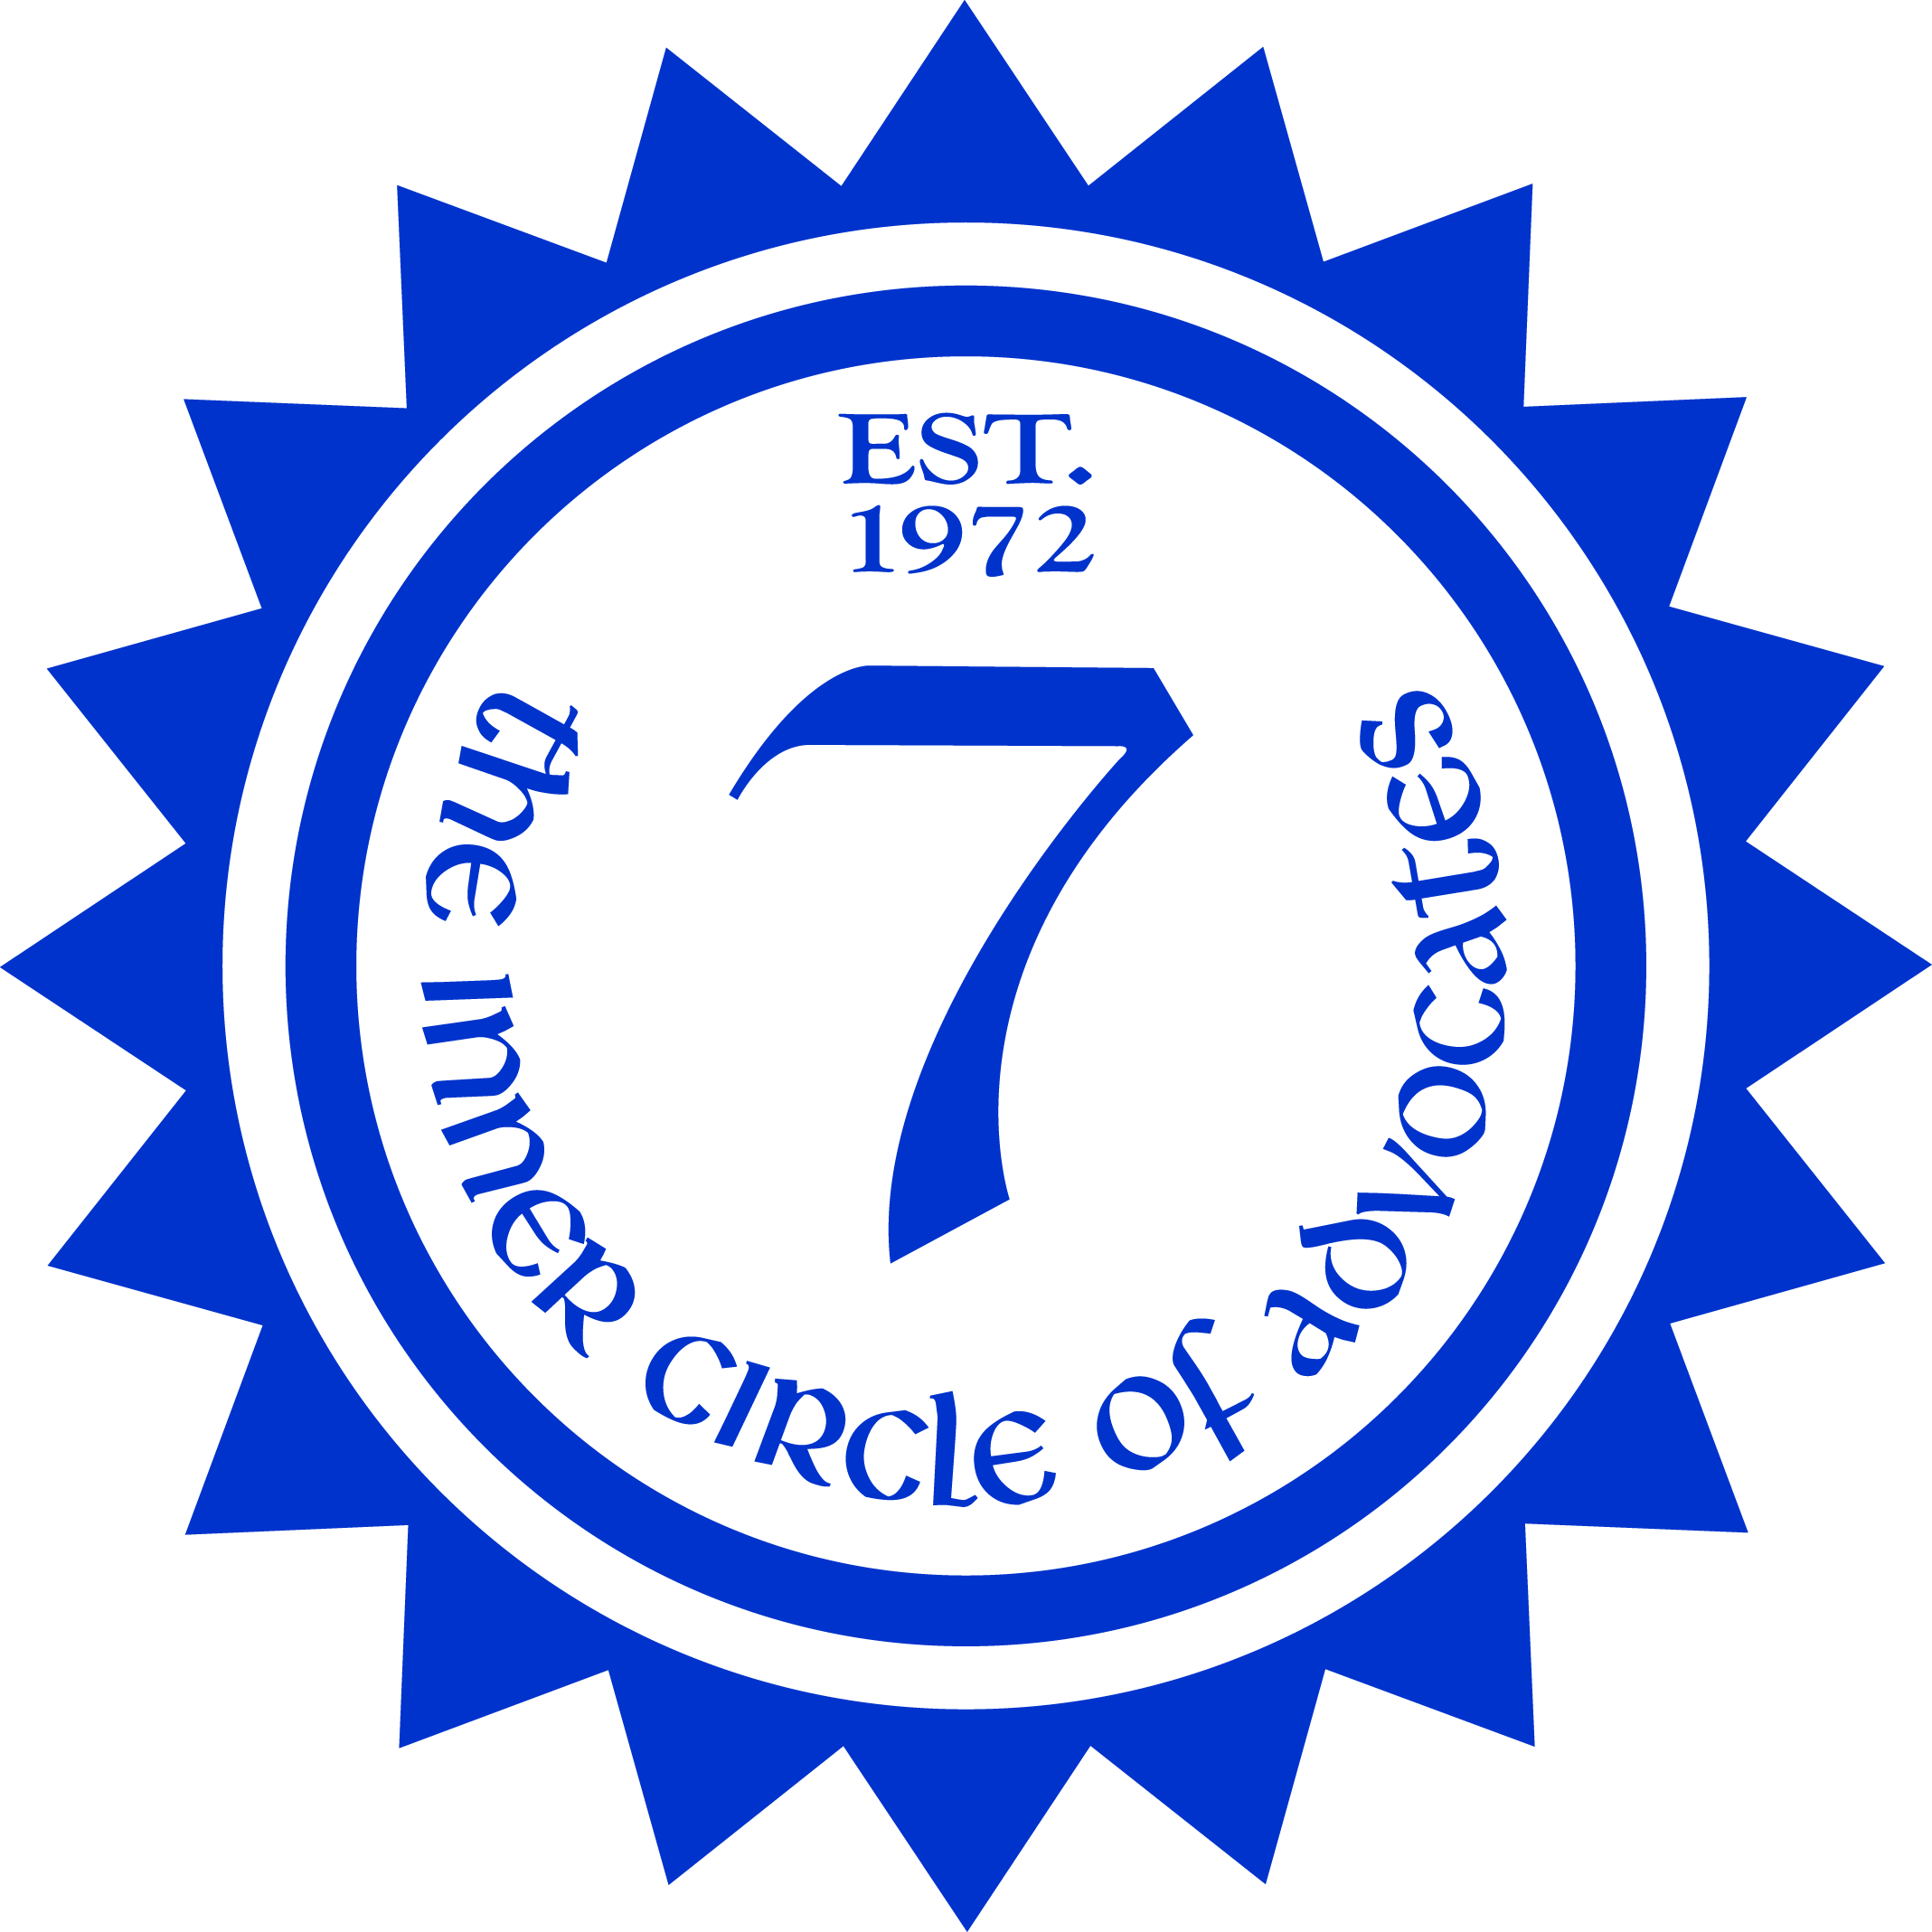 HR inner_circle_logo 2014 transparent